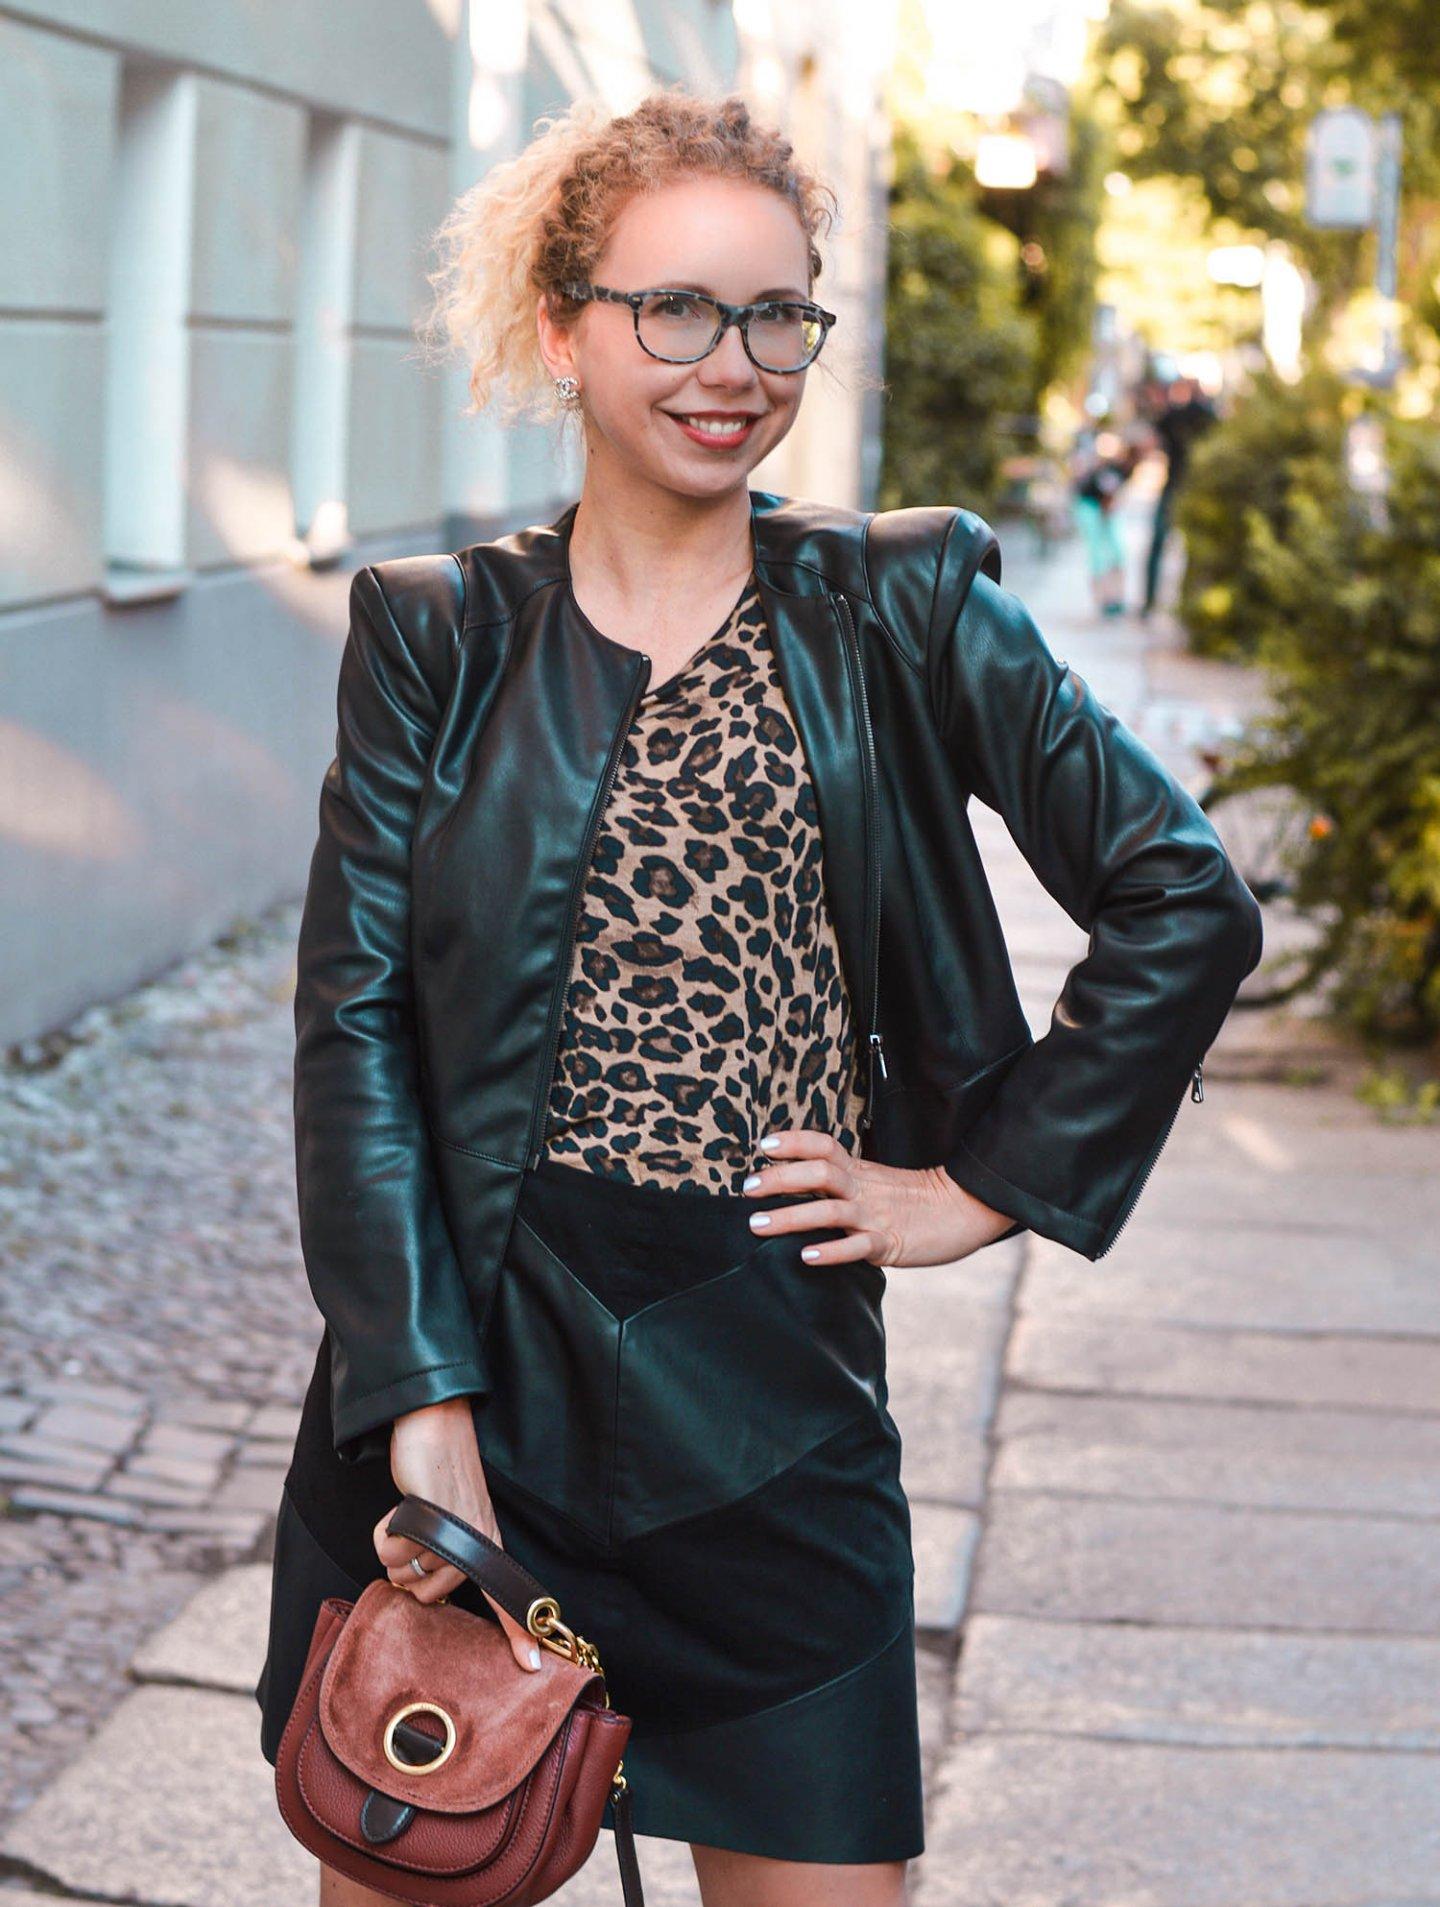 Zara Kunstleder Jacke und Lederrock mit Leomuster Shirt